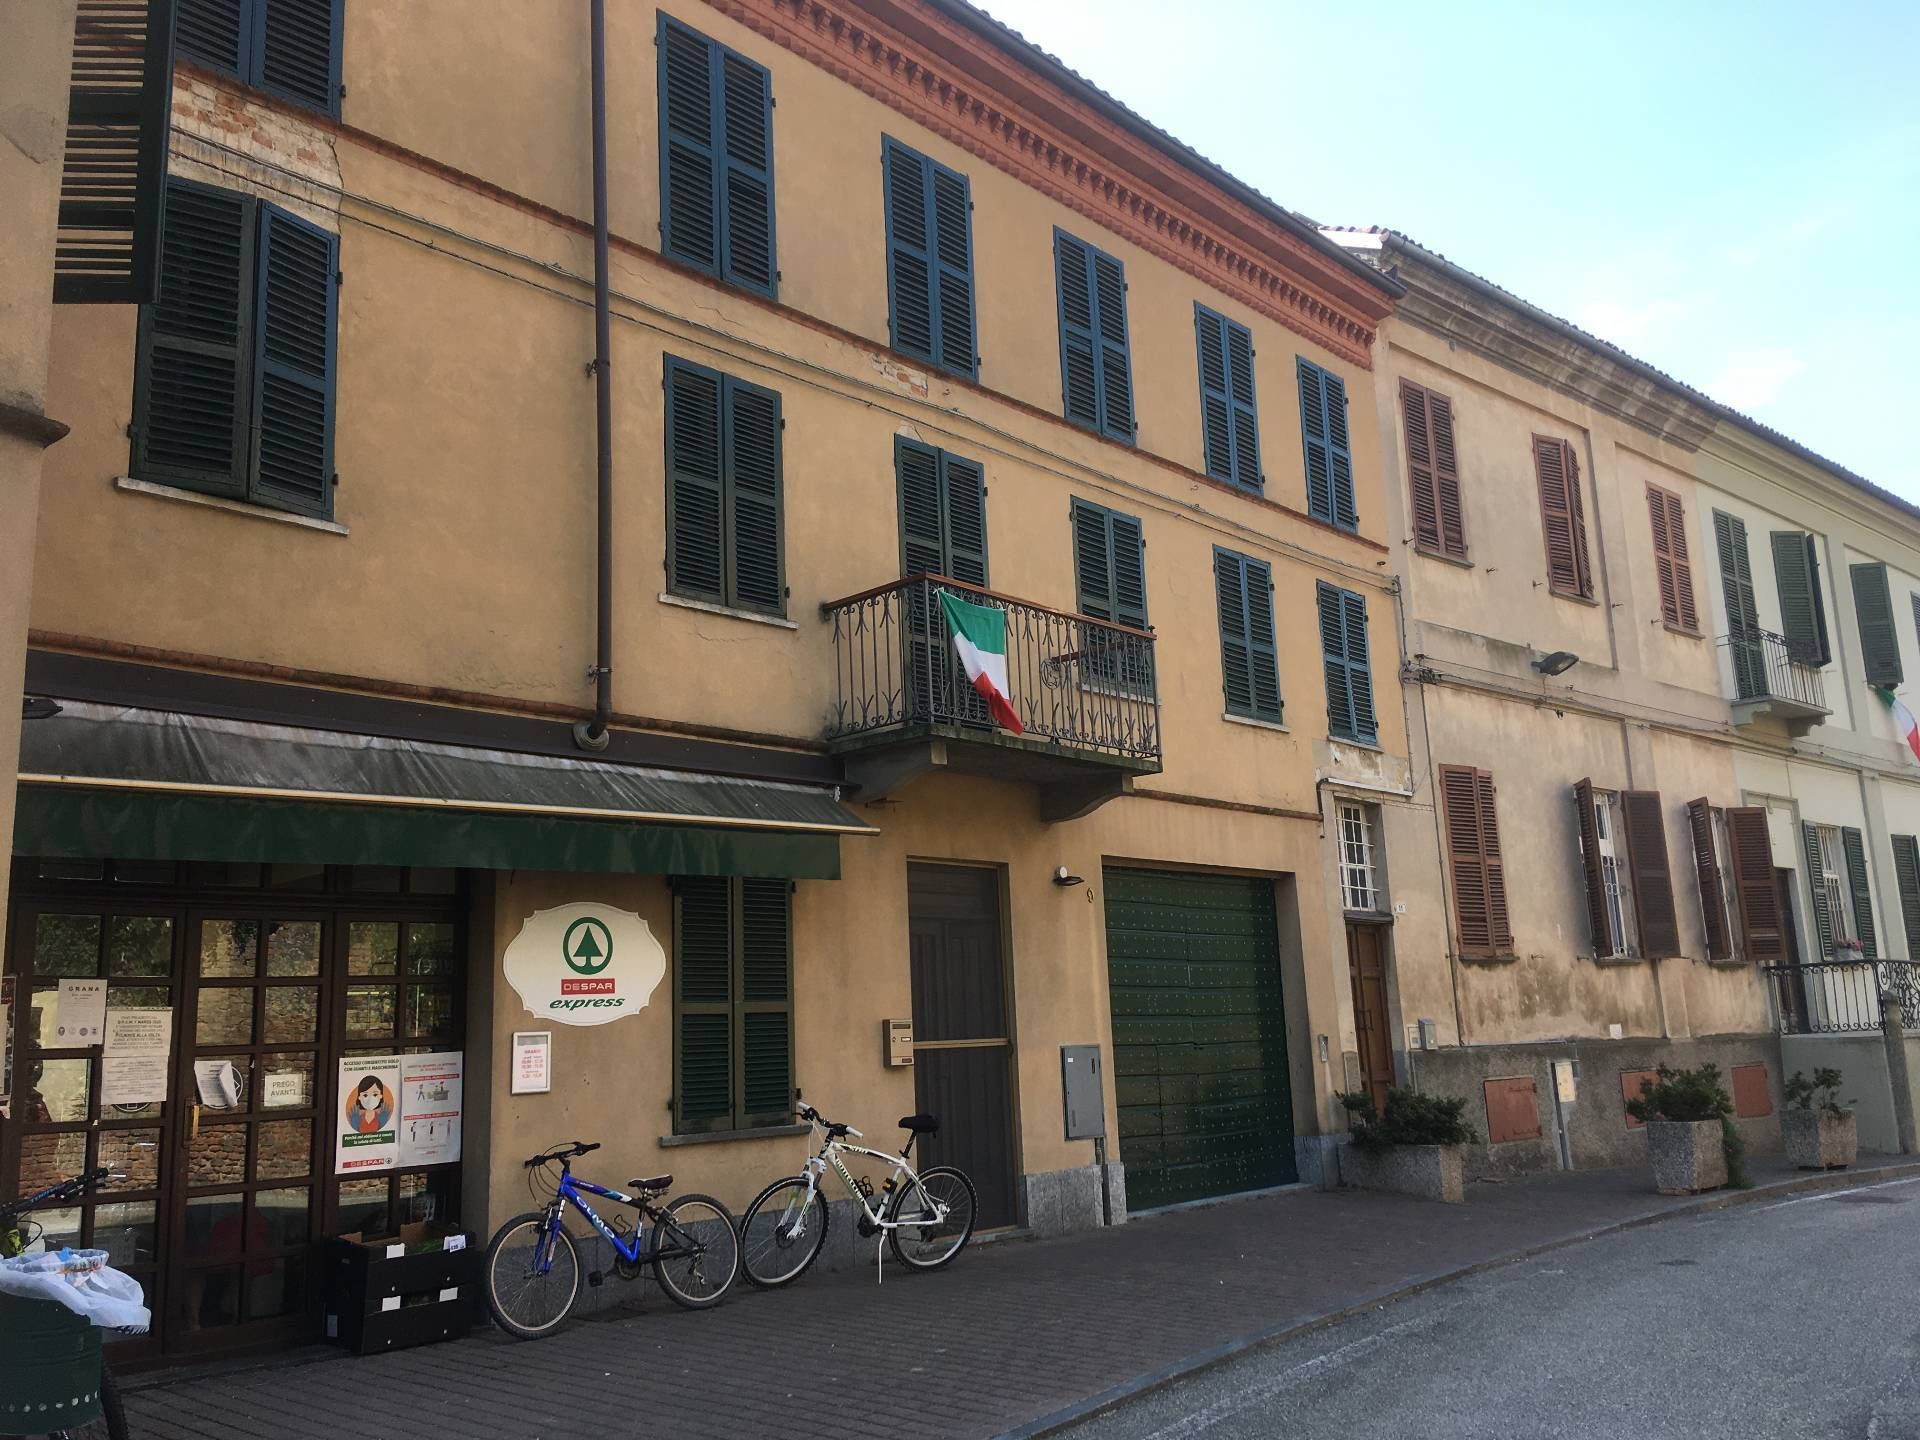 Grana, Corso Garibaldi